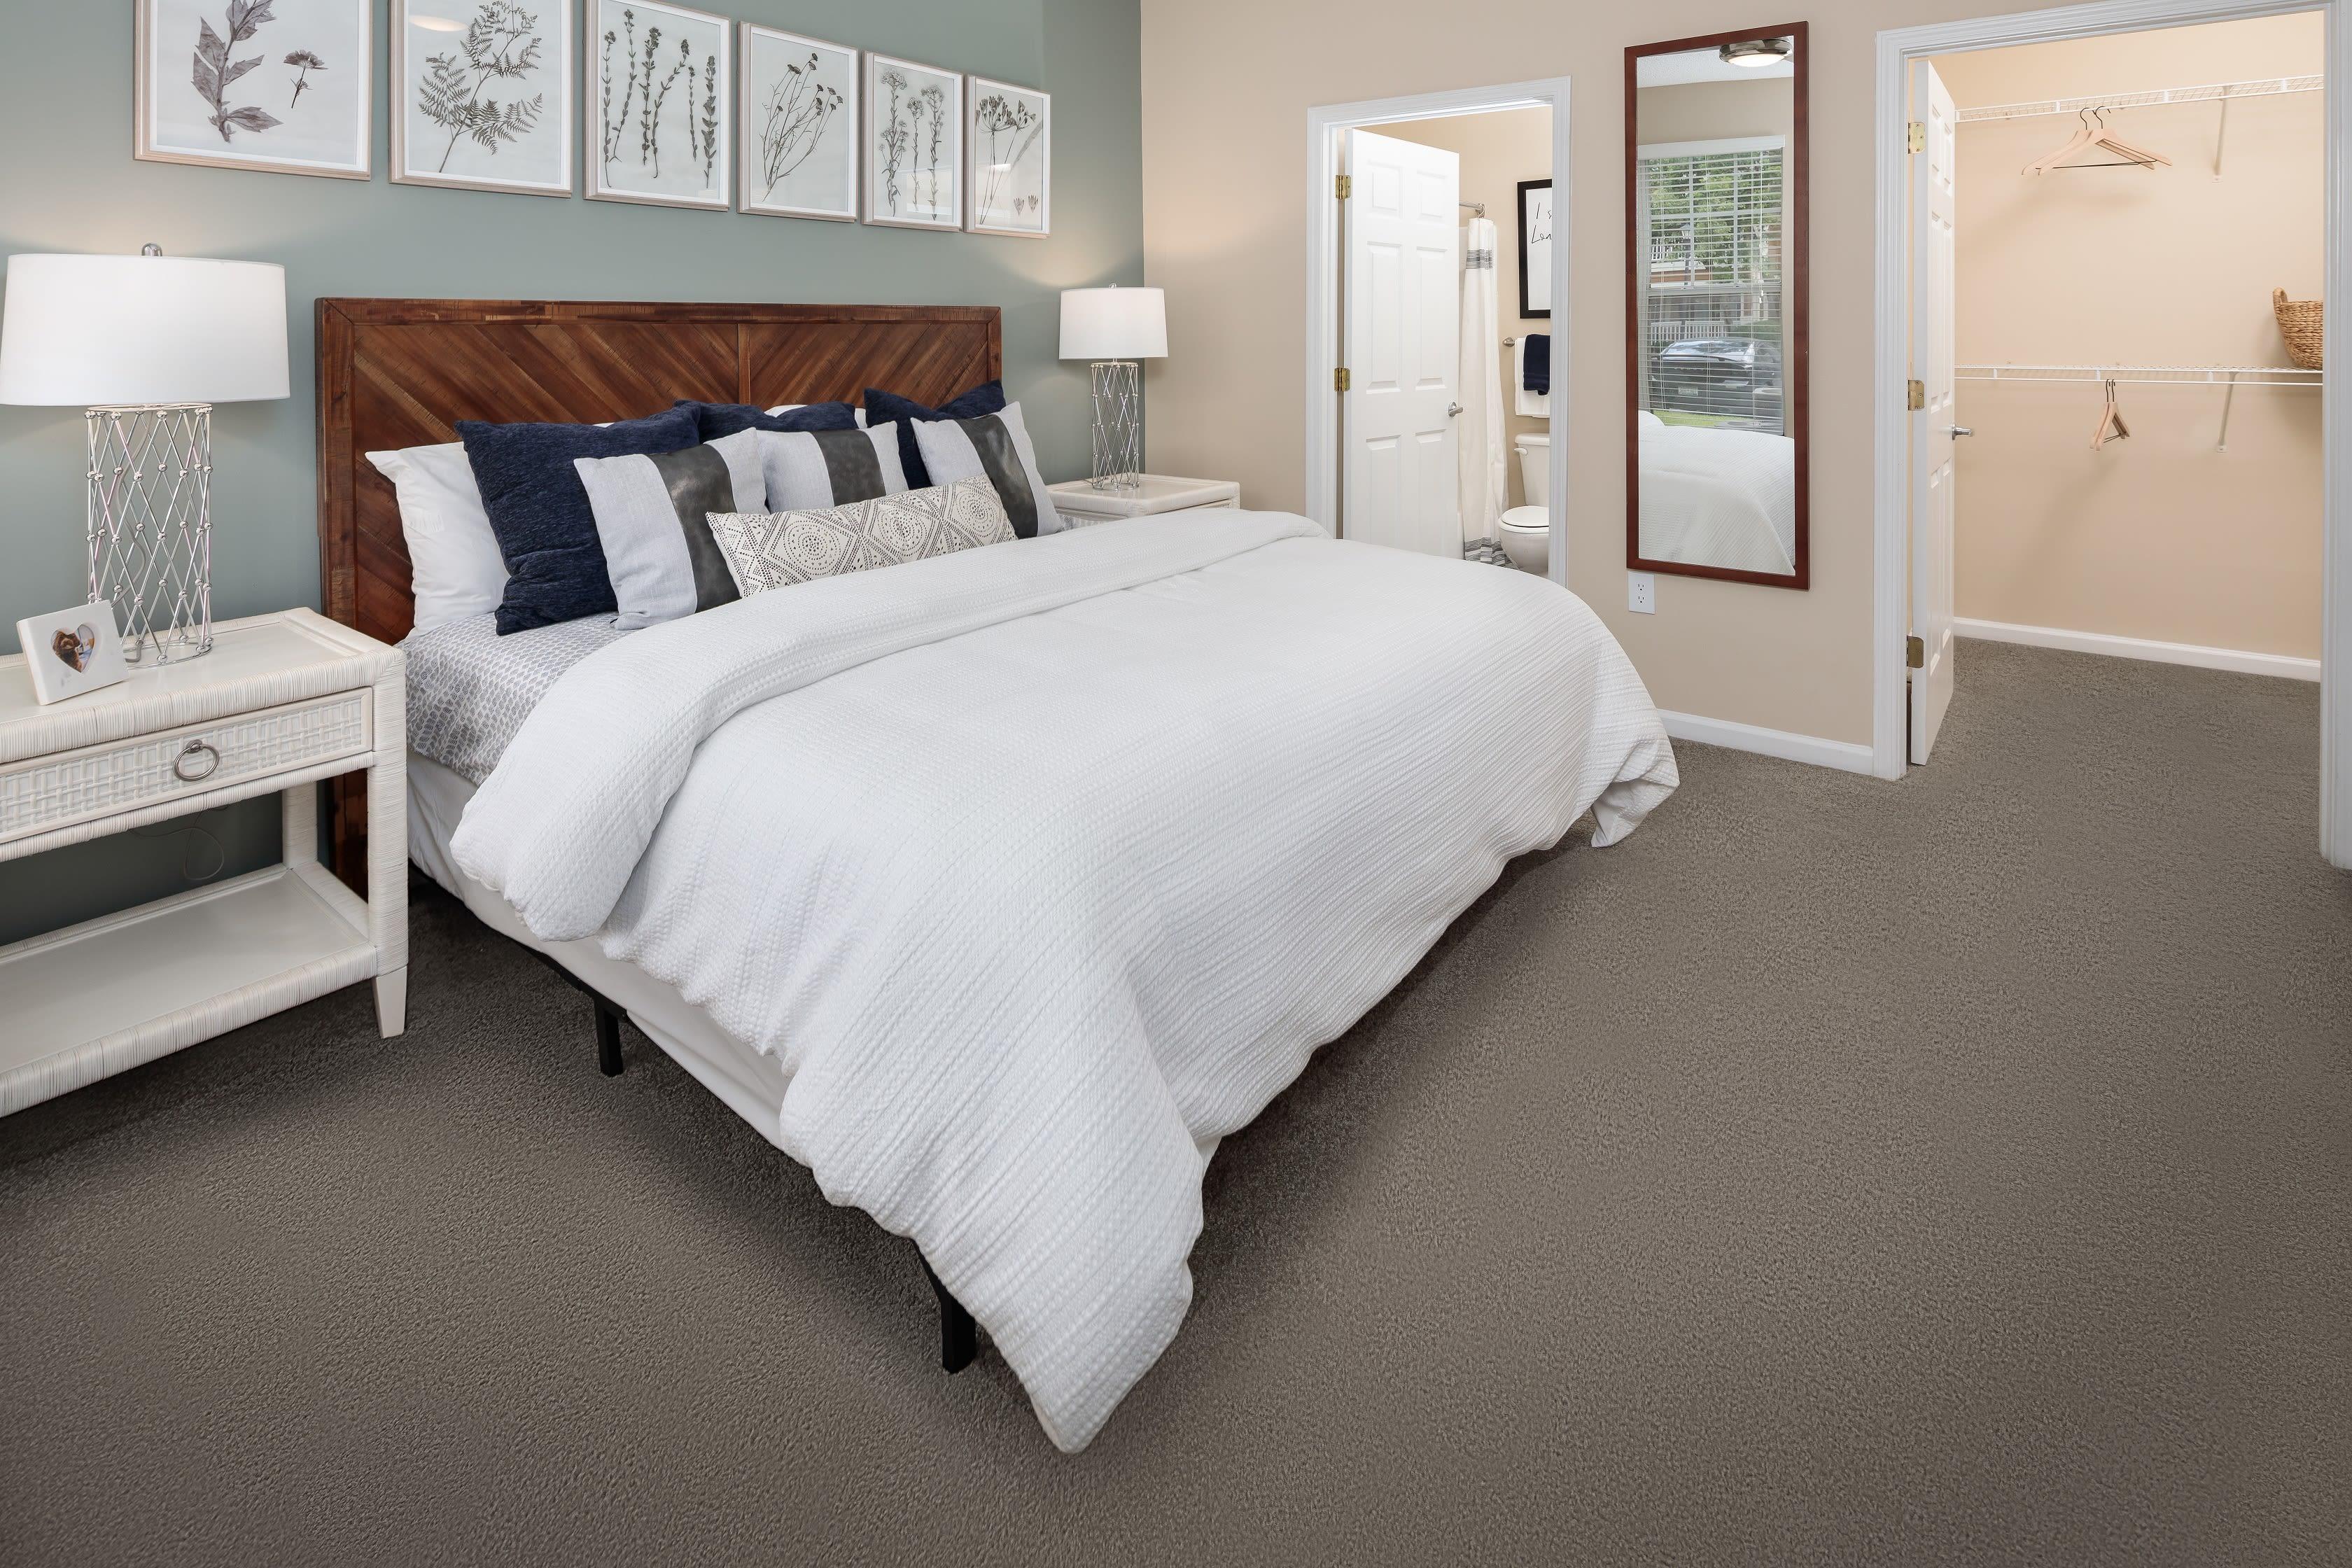 Bedroom at Bryant at Summerville in Summerville, South Carolina